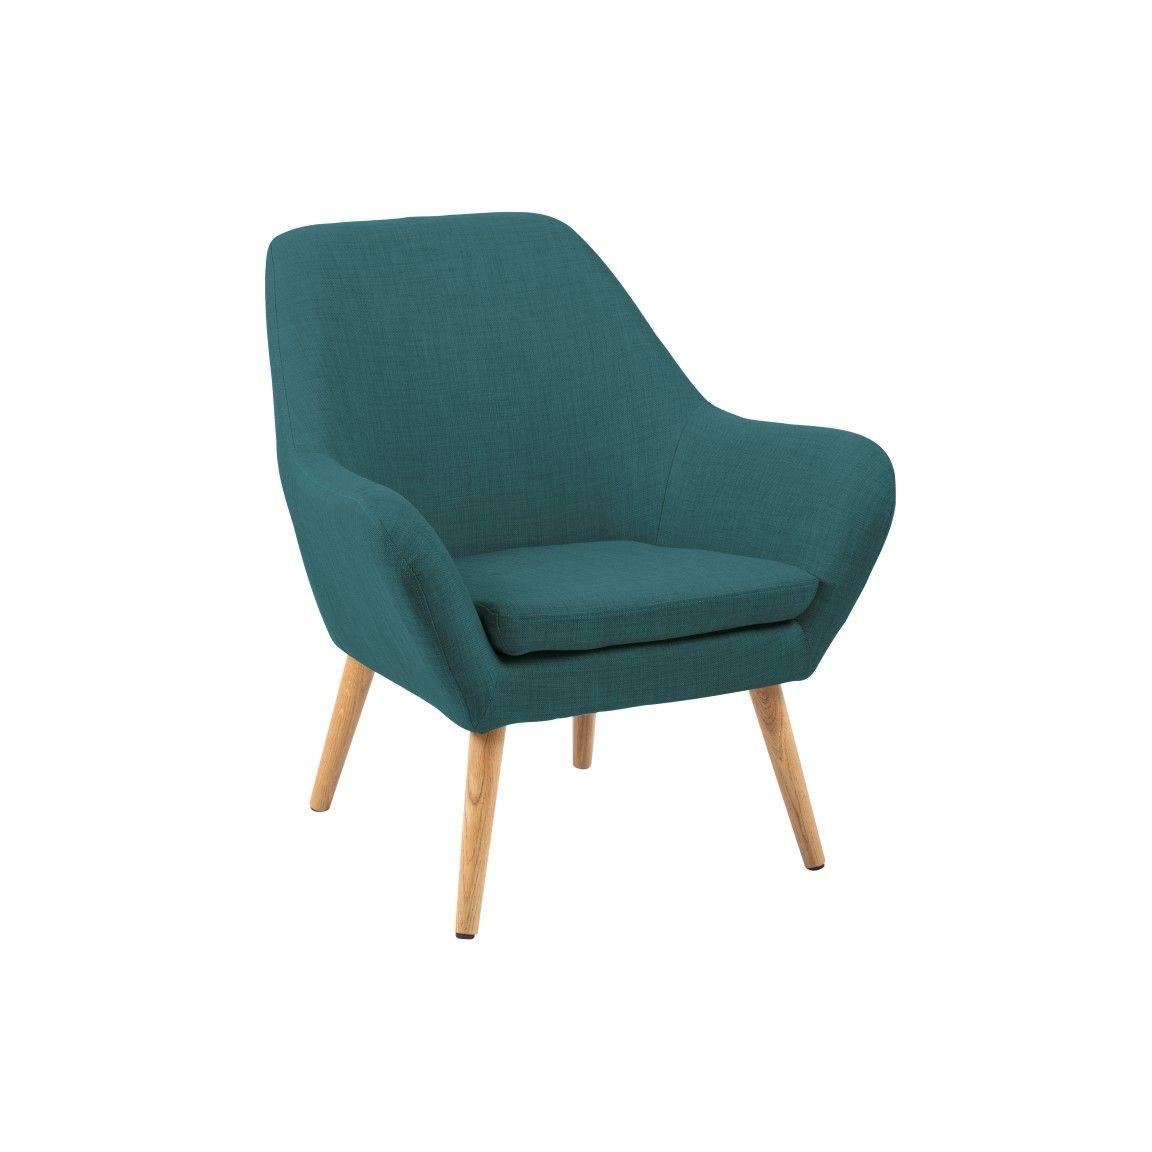 Resting Chair Melvis | Petrol